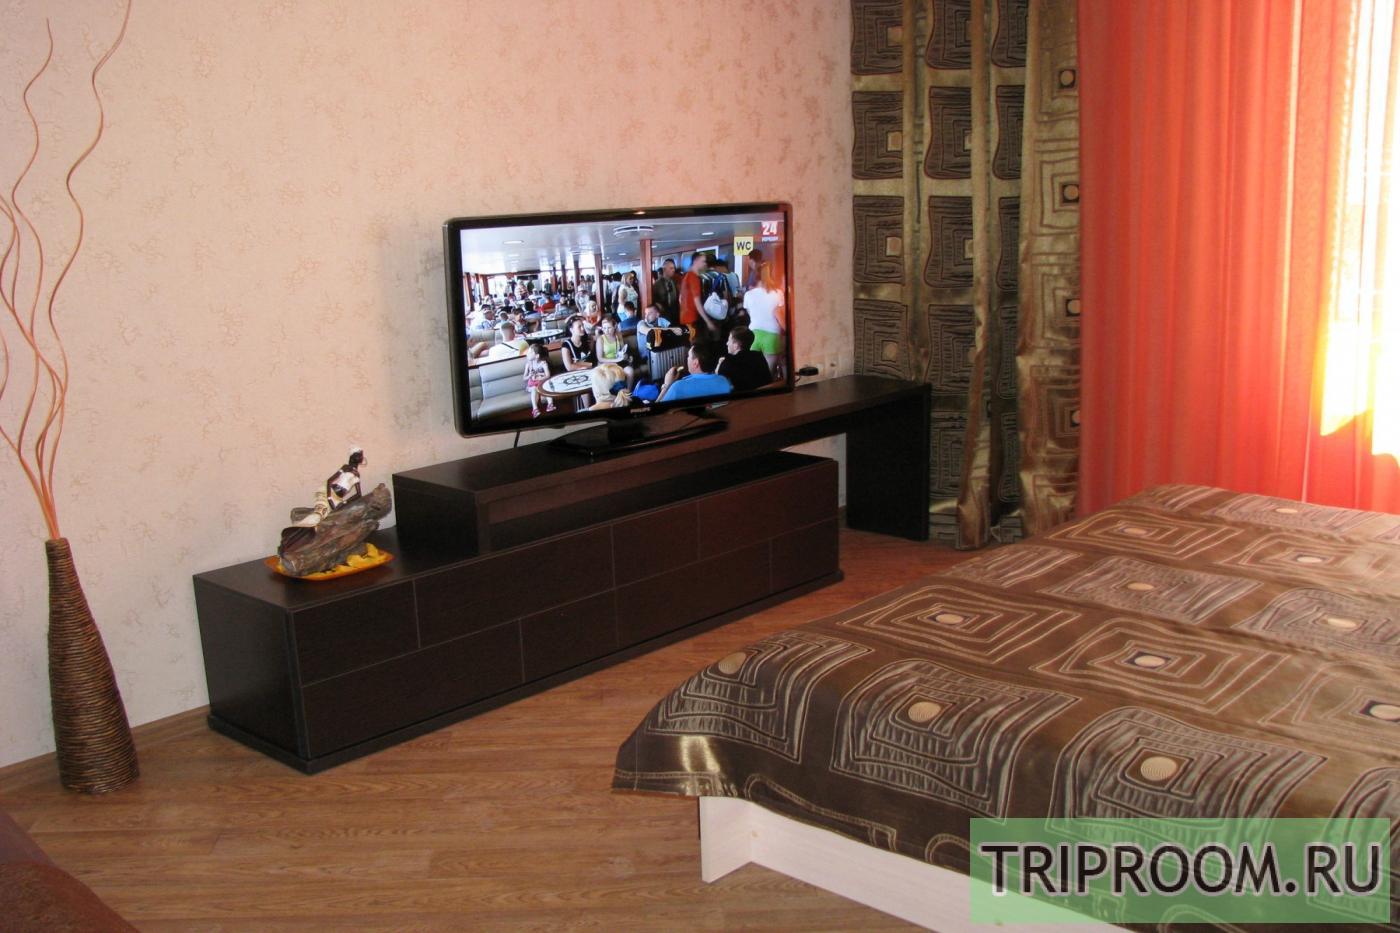 1-комнатная квартира посуточно (вариант № 34740), ул. Репина улица, фото № 1